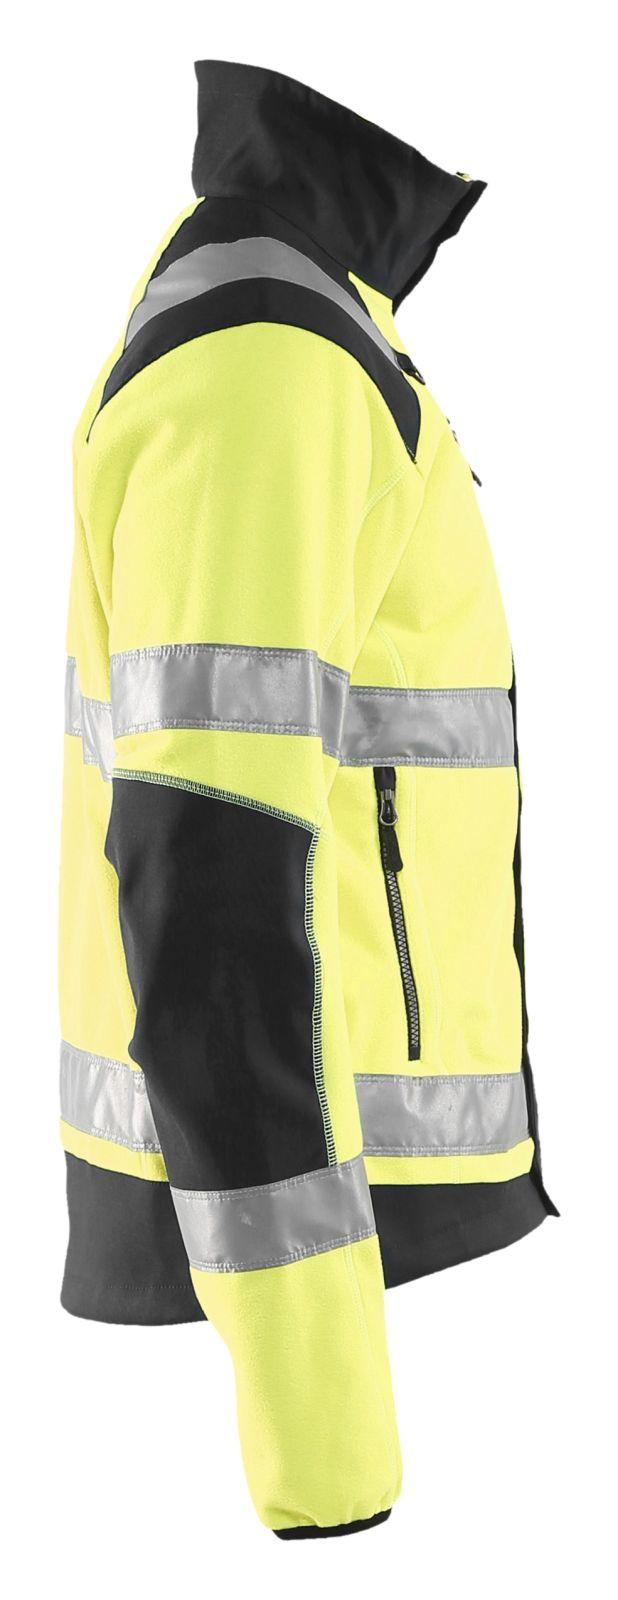 Blaklader Fleece jassen 48882524 High Vis geel-zwart(3399)